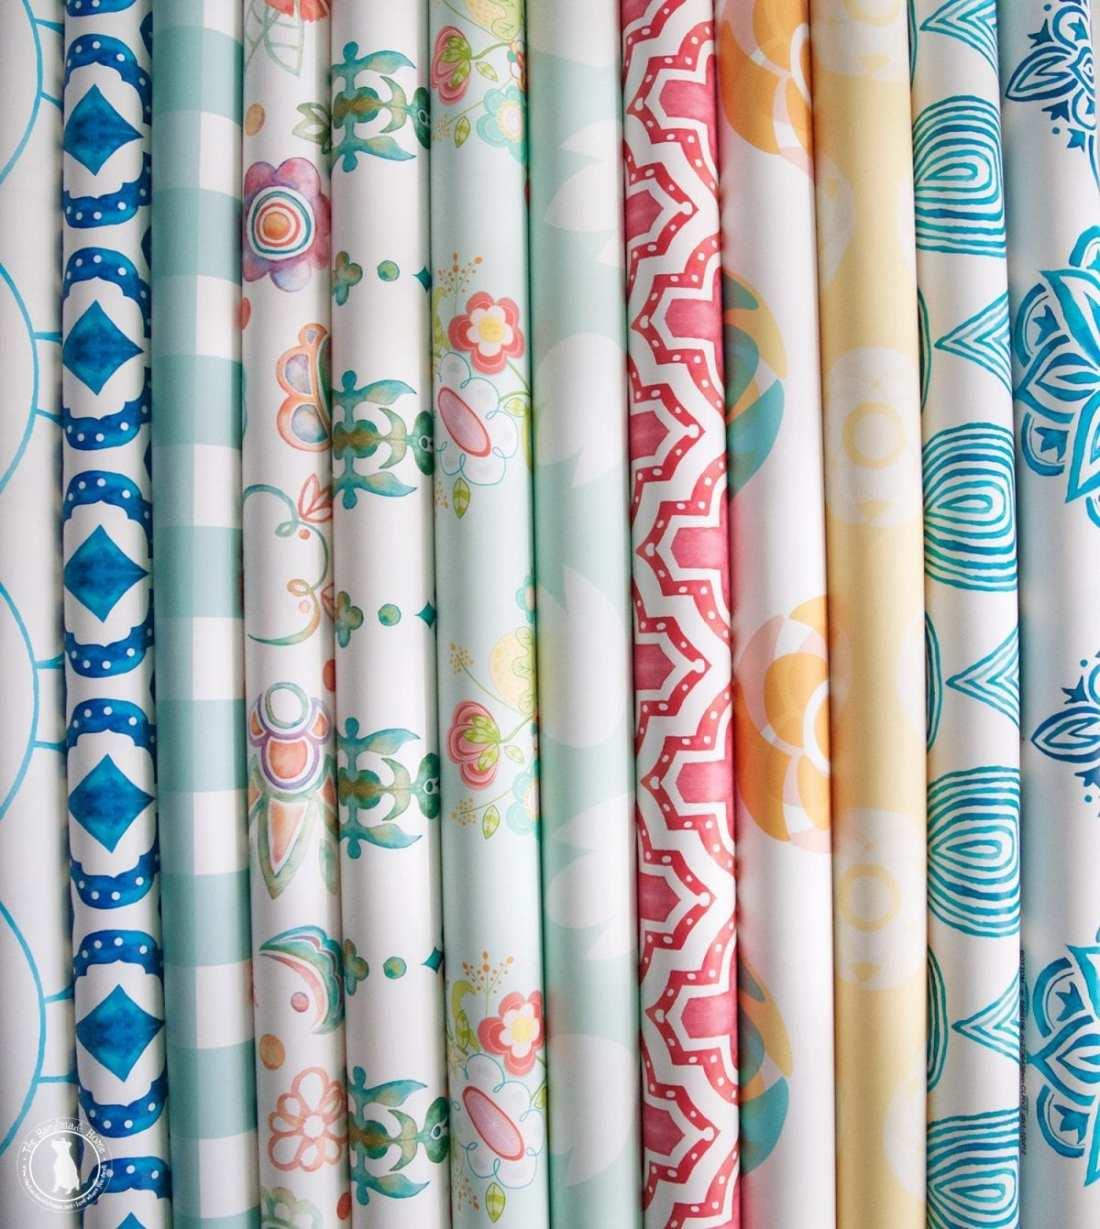 wallpaper_rolls